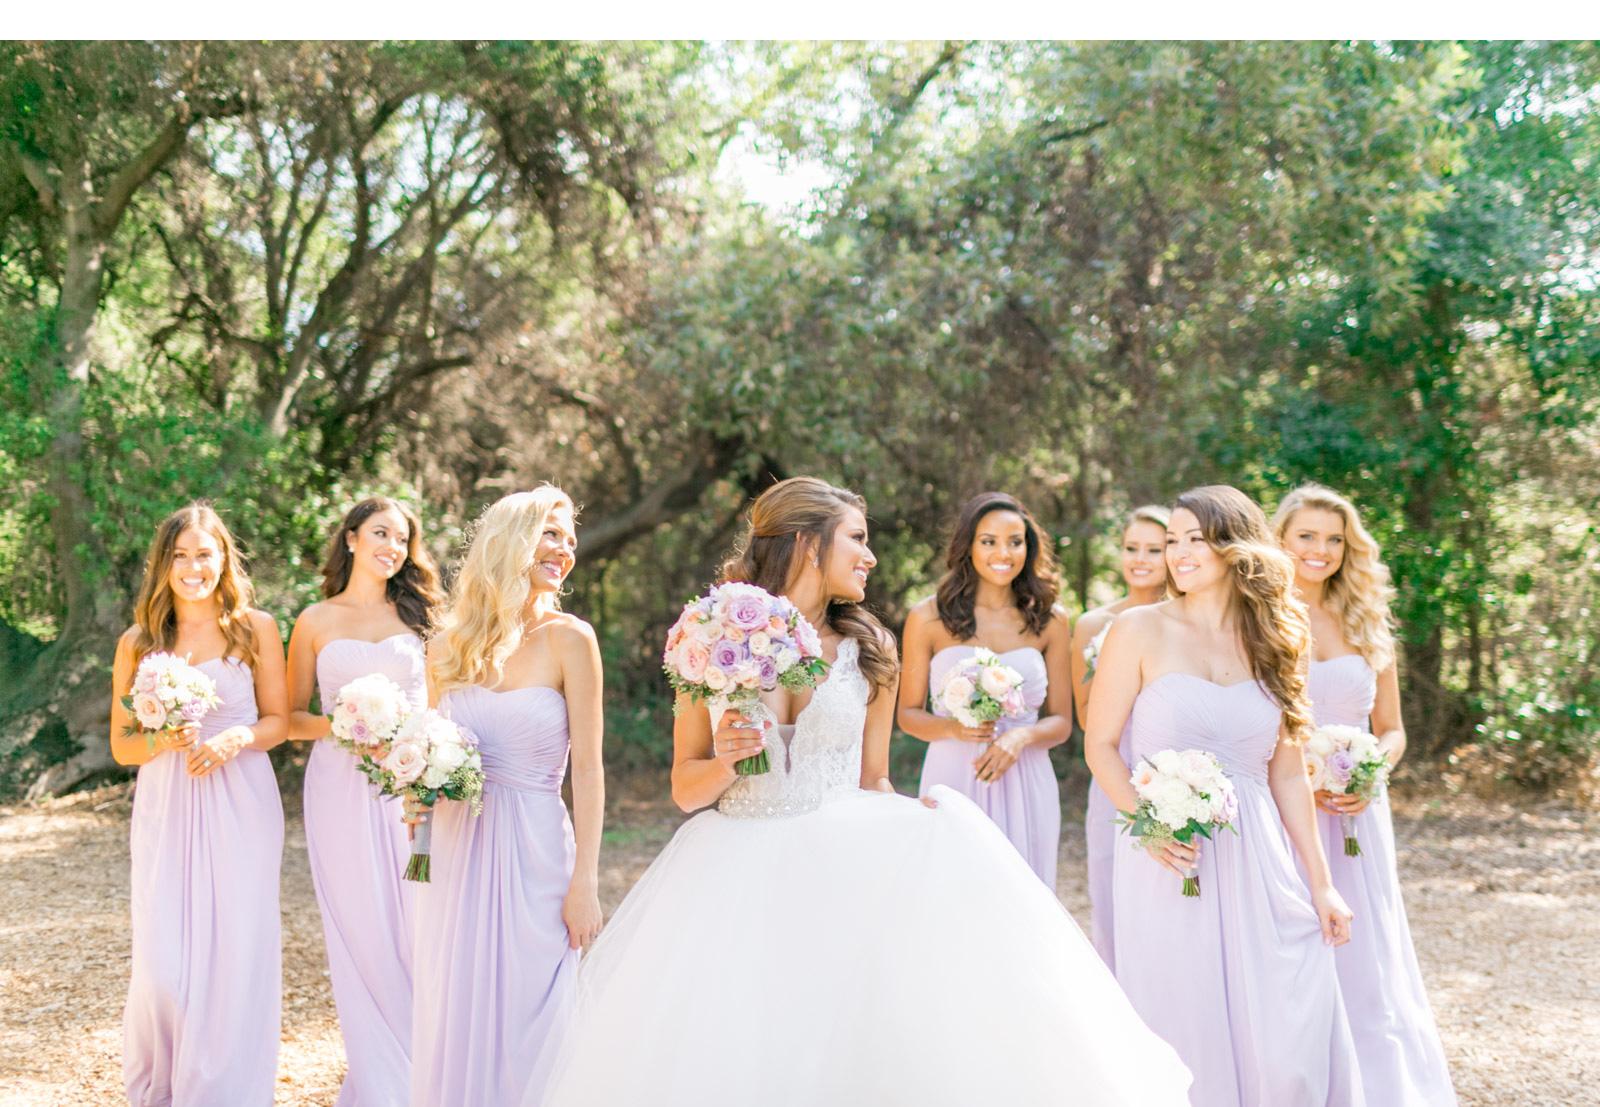 Miss-USA-Temecula-Wedding-Natalie-Schutt-Photography_08.jpg